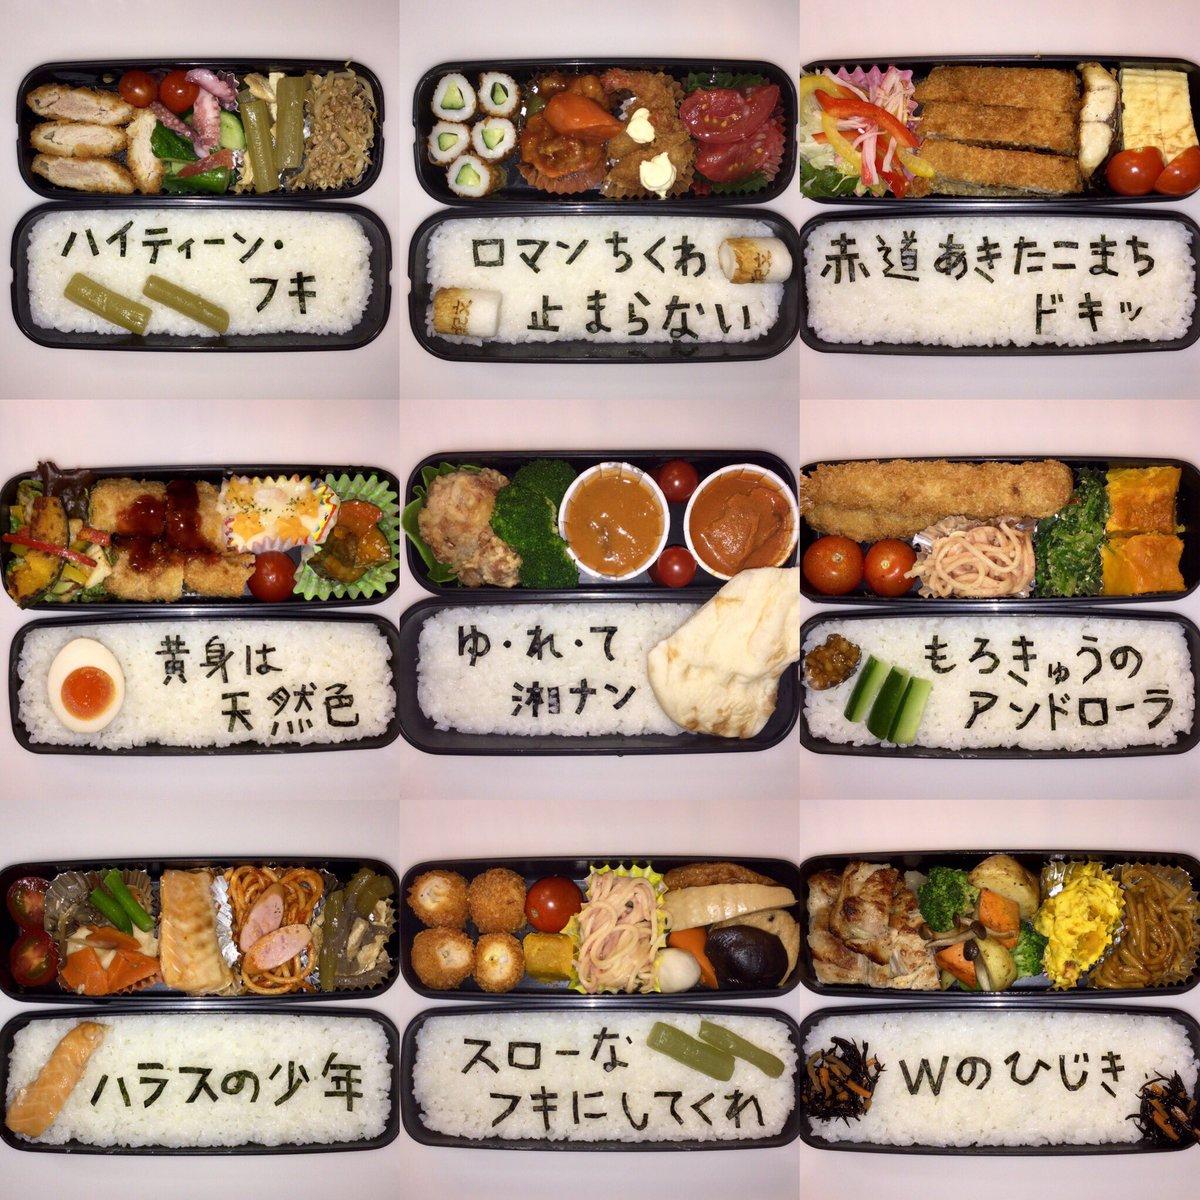 "RT @norimoji_aya: 海苔文字弁当!NHKFMラジオで「今日は一日""松本隆ソング三昧""」をお昼から聴いています❣️名曲の数々あっと言う間に夜!後半は19時20分から♪ #松本隆三昧 https://t.co/lOuoGuj68c"